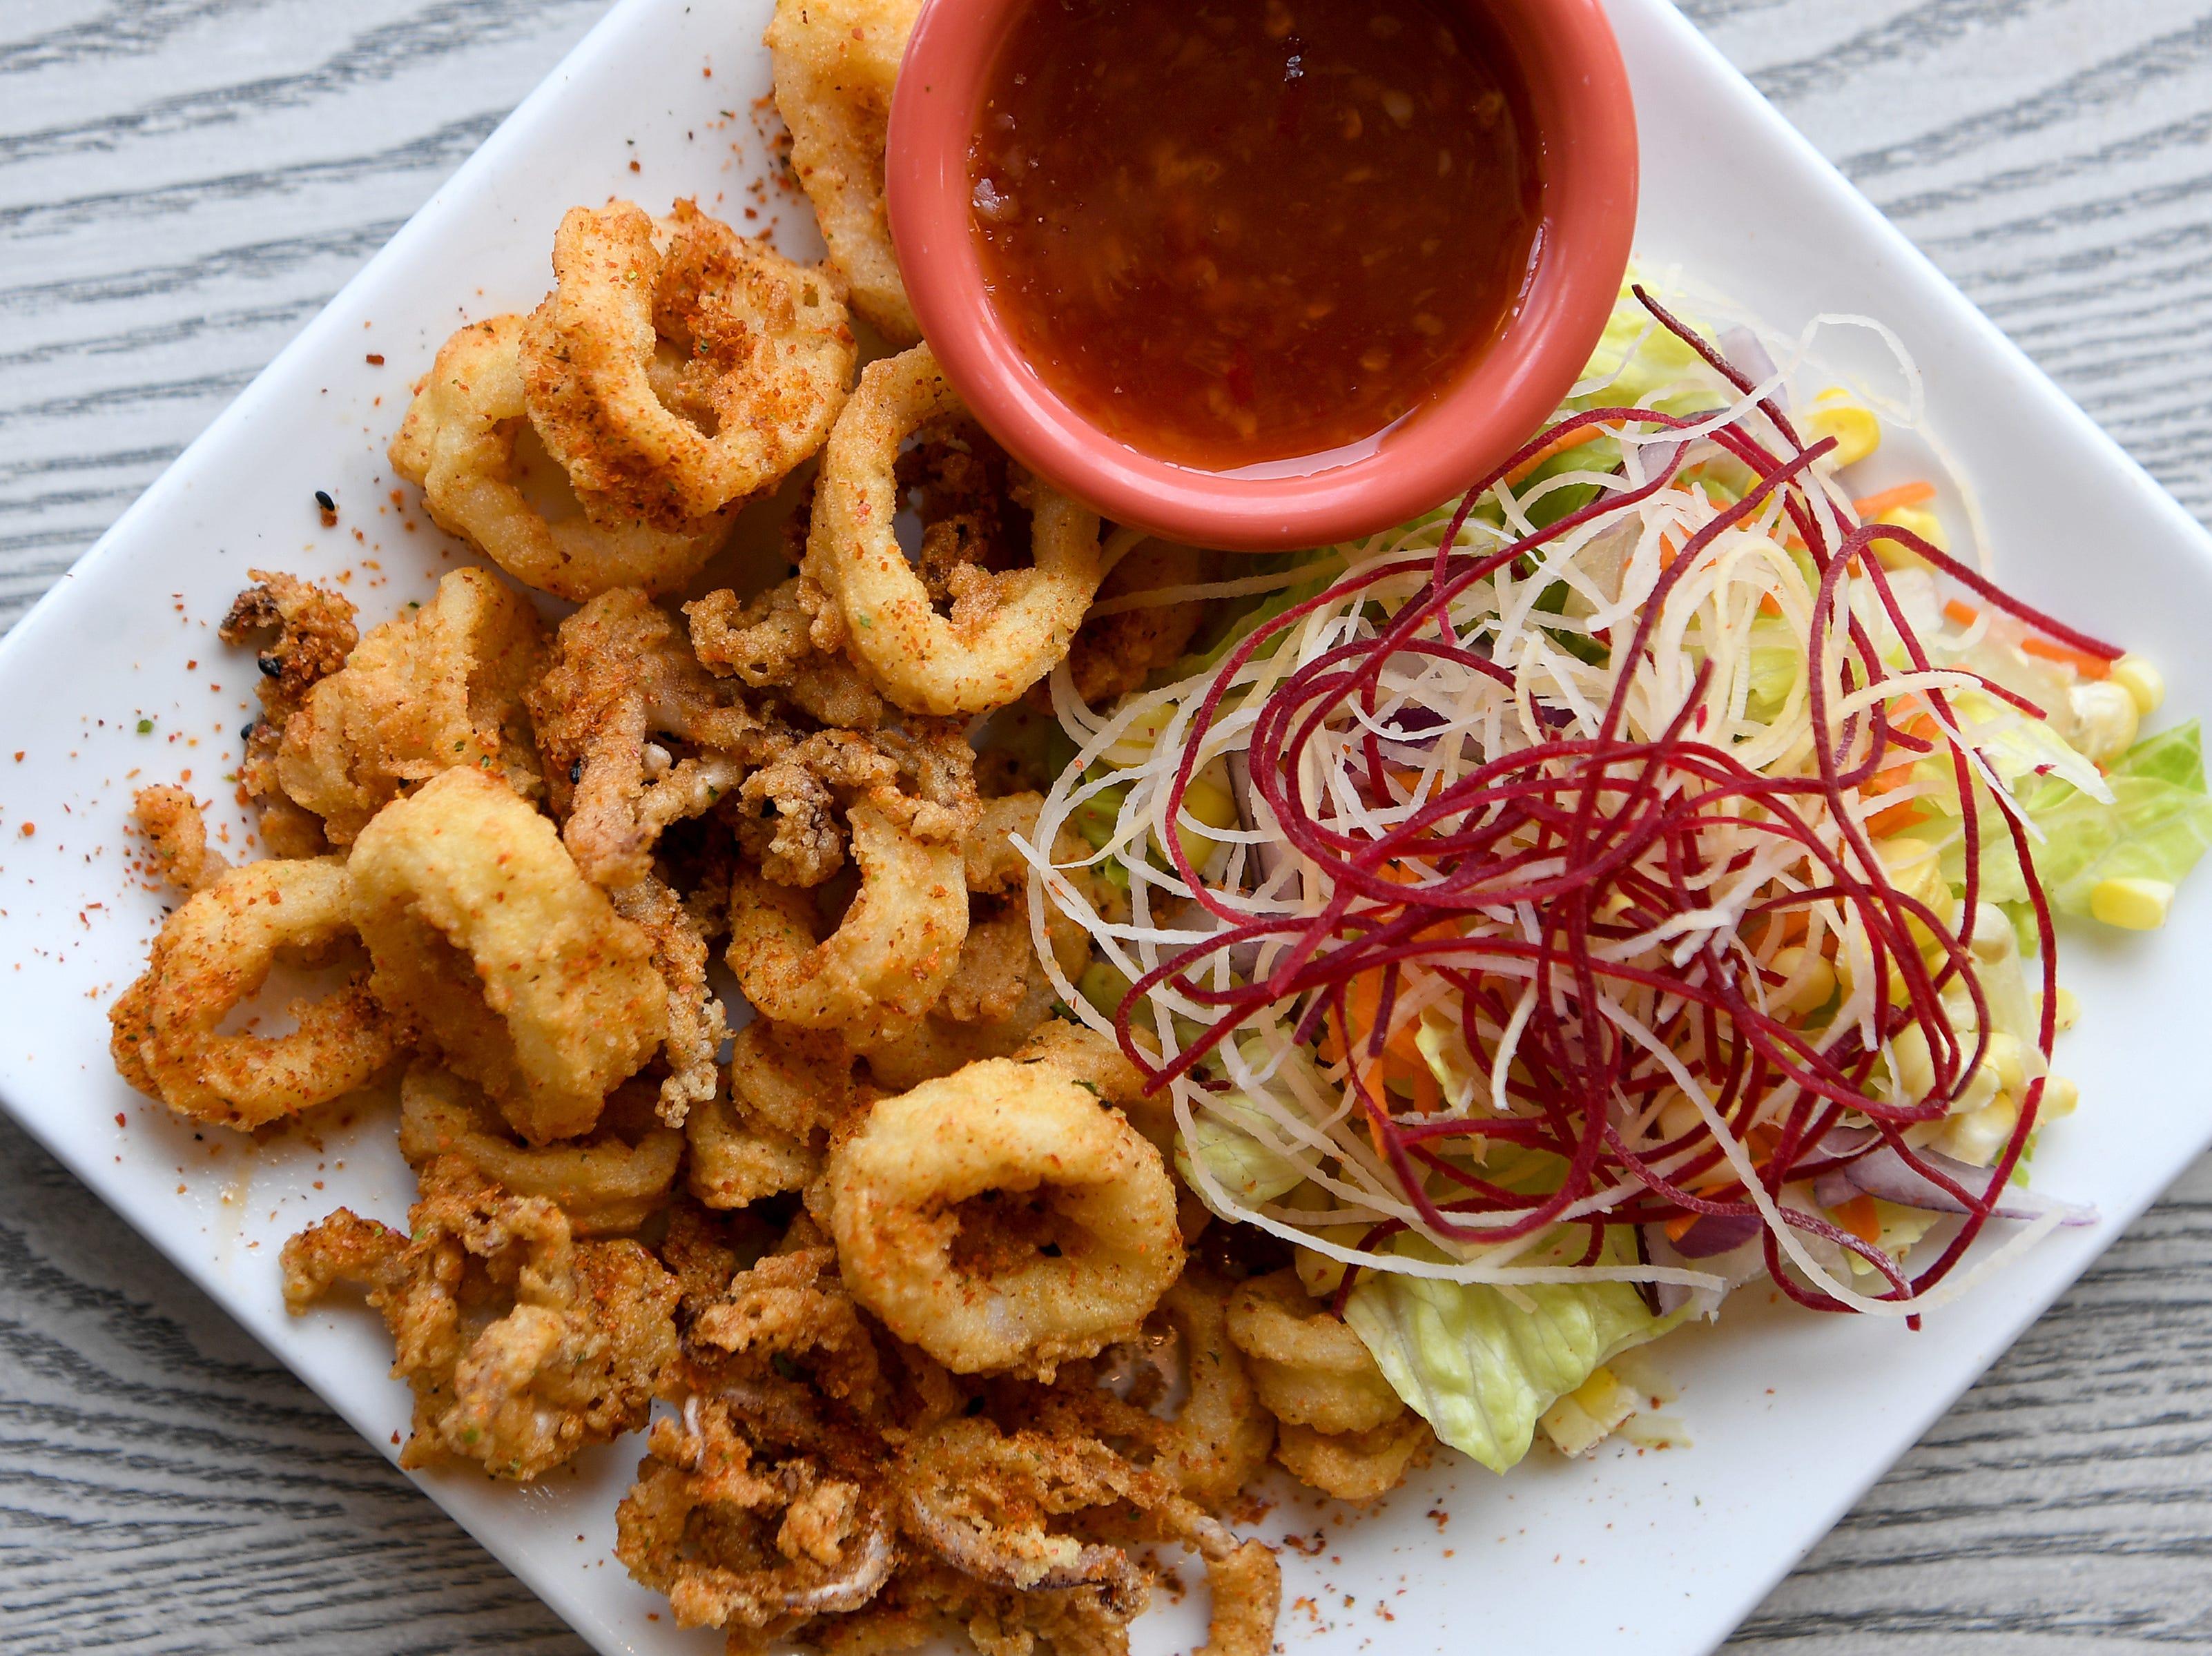 The crispy fried calamari at Takosushi is seasoned with Togarishi pepper and served with Asian sweet chili sauce.